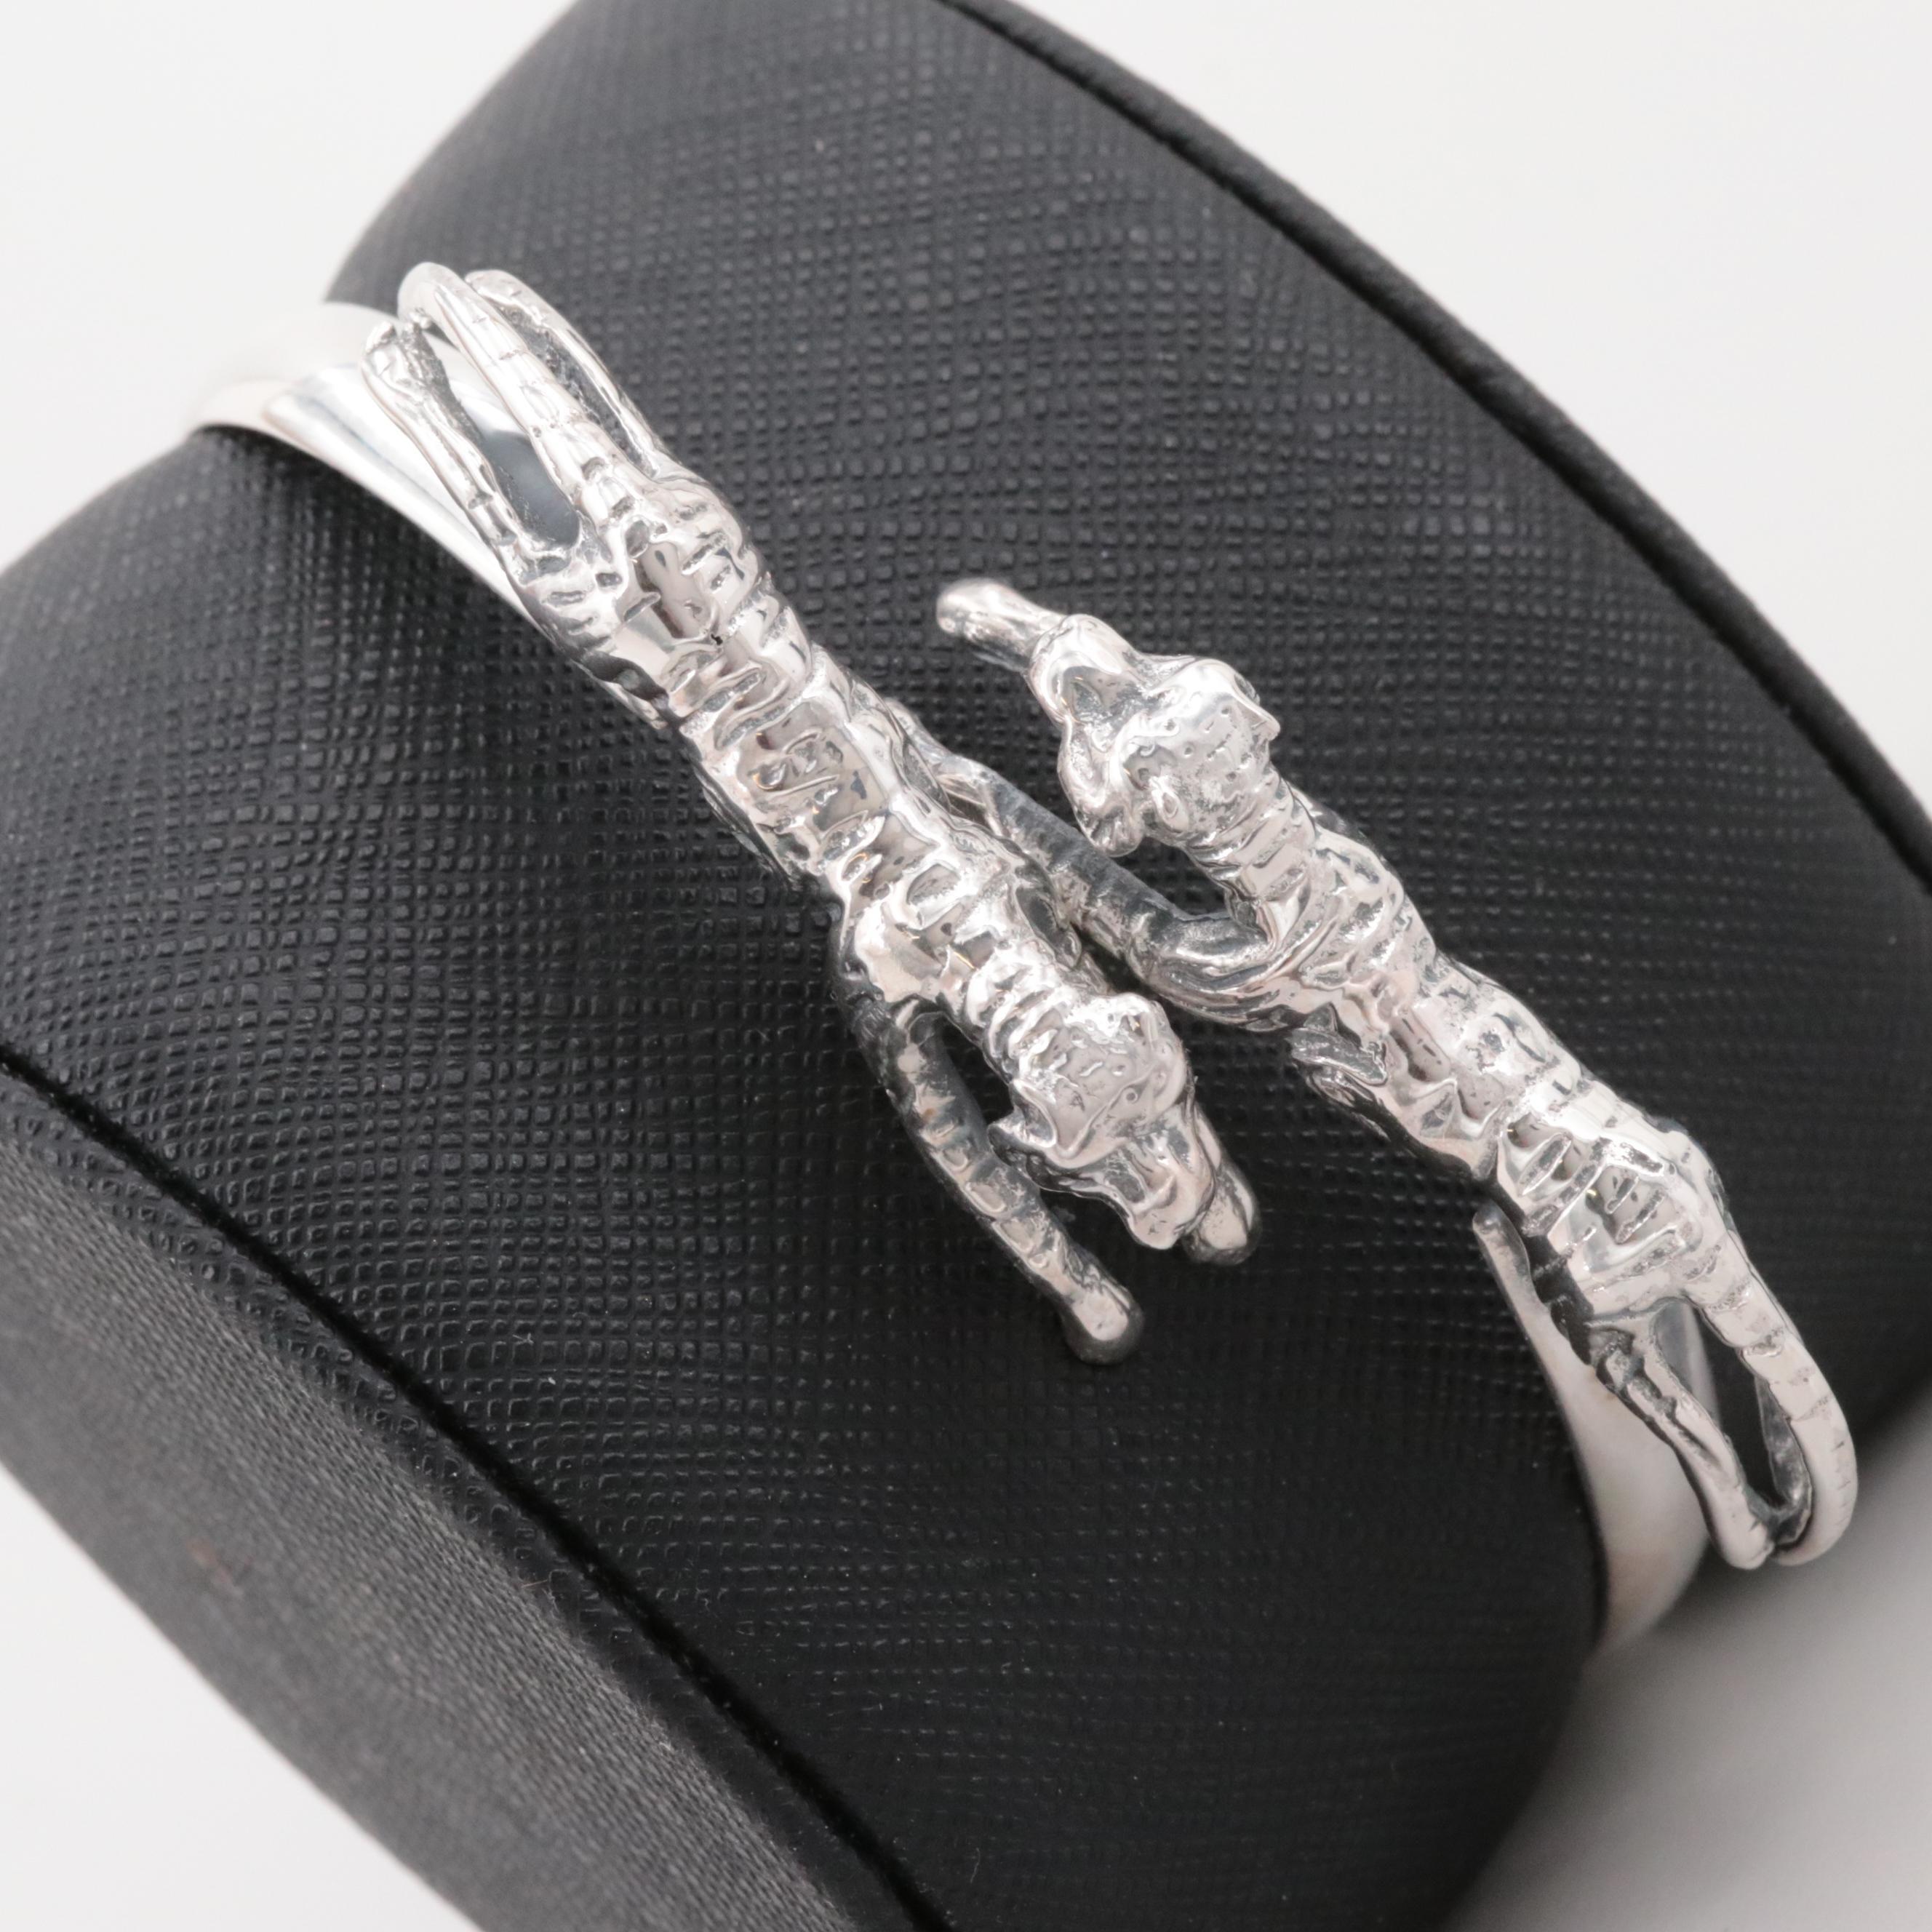 Sterling Silver Double Tiger Bangle Bracelet